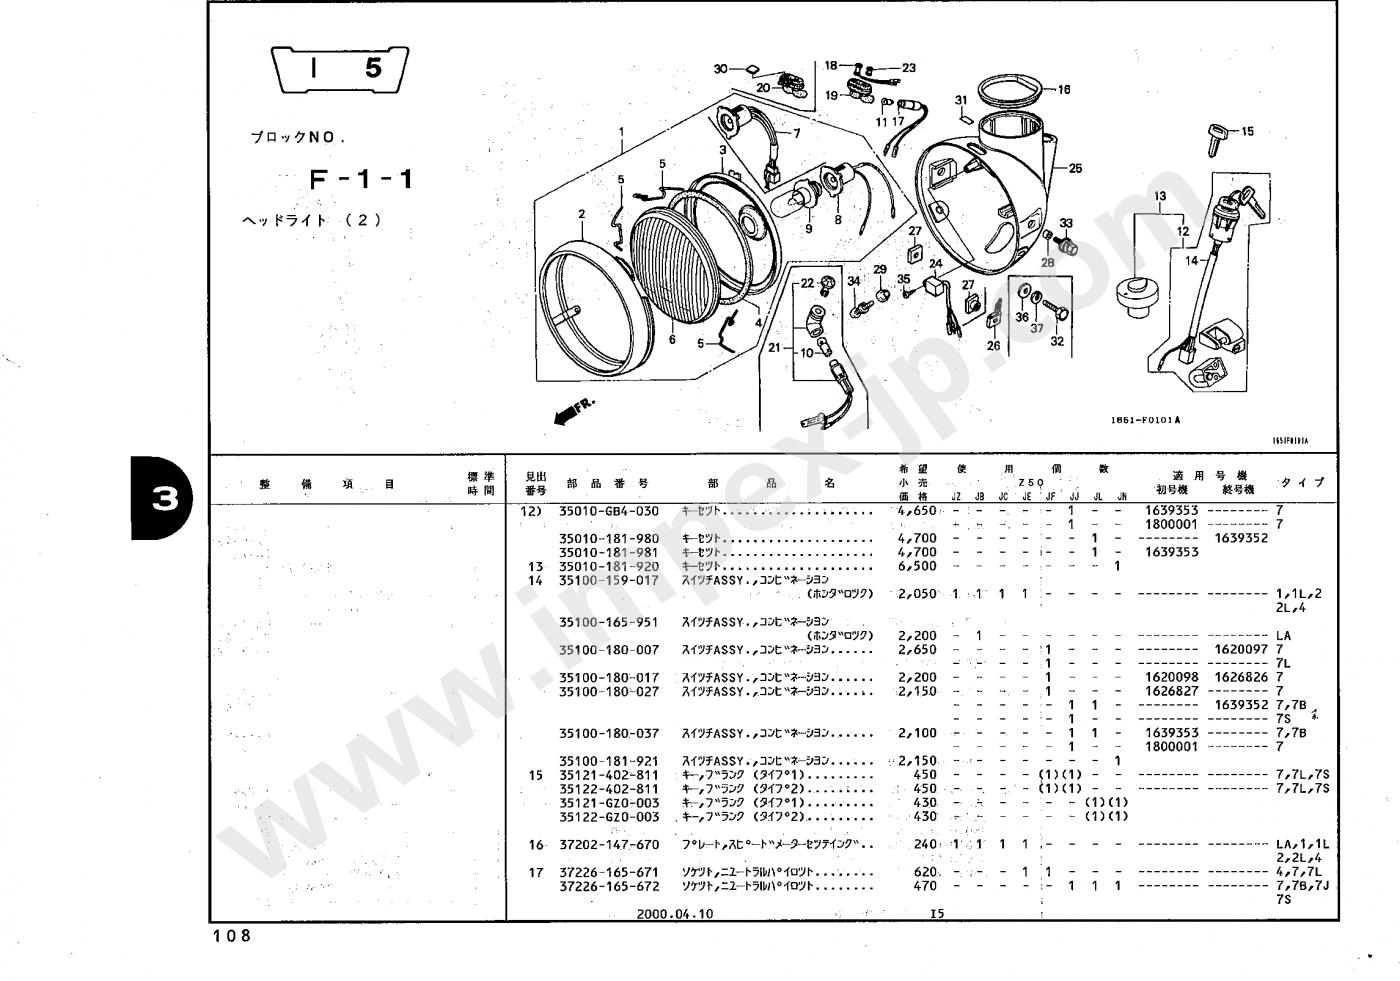 Motorcycle Parts Honda Monkey Gorilla Z50j 130 141 1 7l Engine Diagram 142 150 160 162 163 180 200 Impex Japan